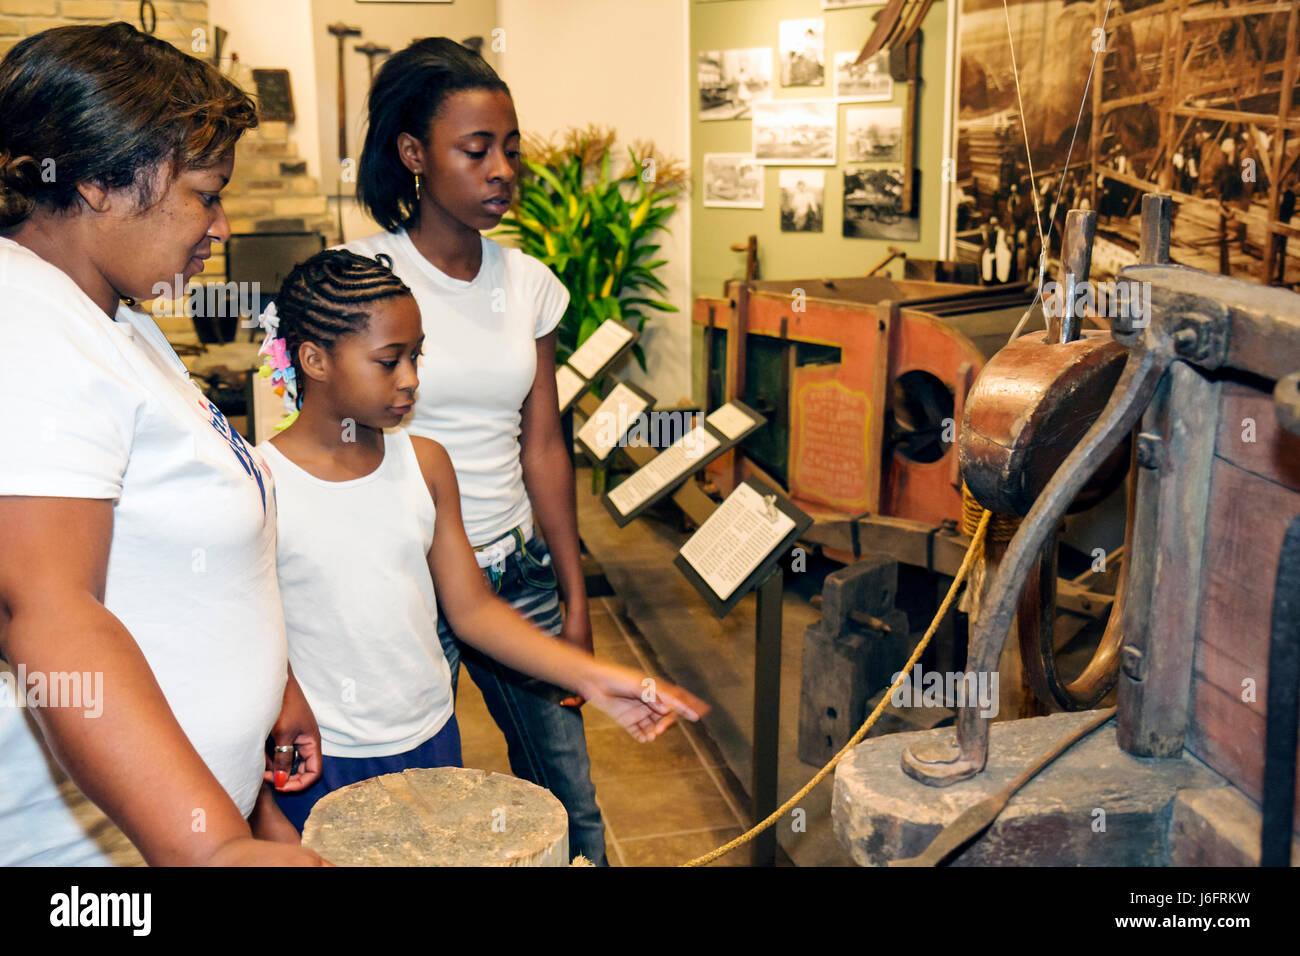 Wisconsin Kenosha Simmons Island Kenosha History Center Yesteryear Gallery Black woman girl teen mother child family - Stock Image